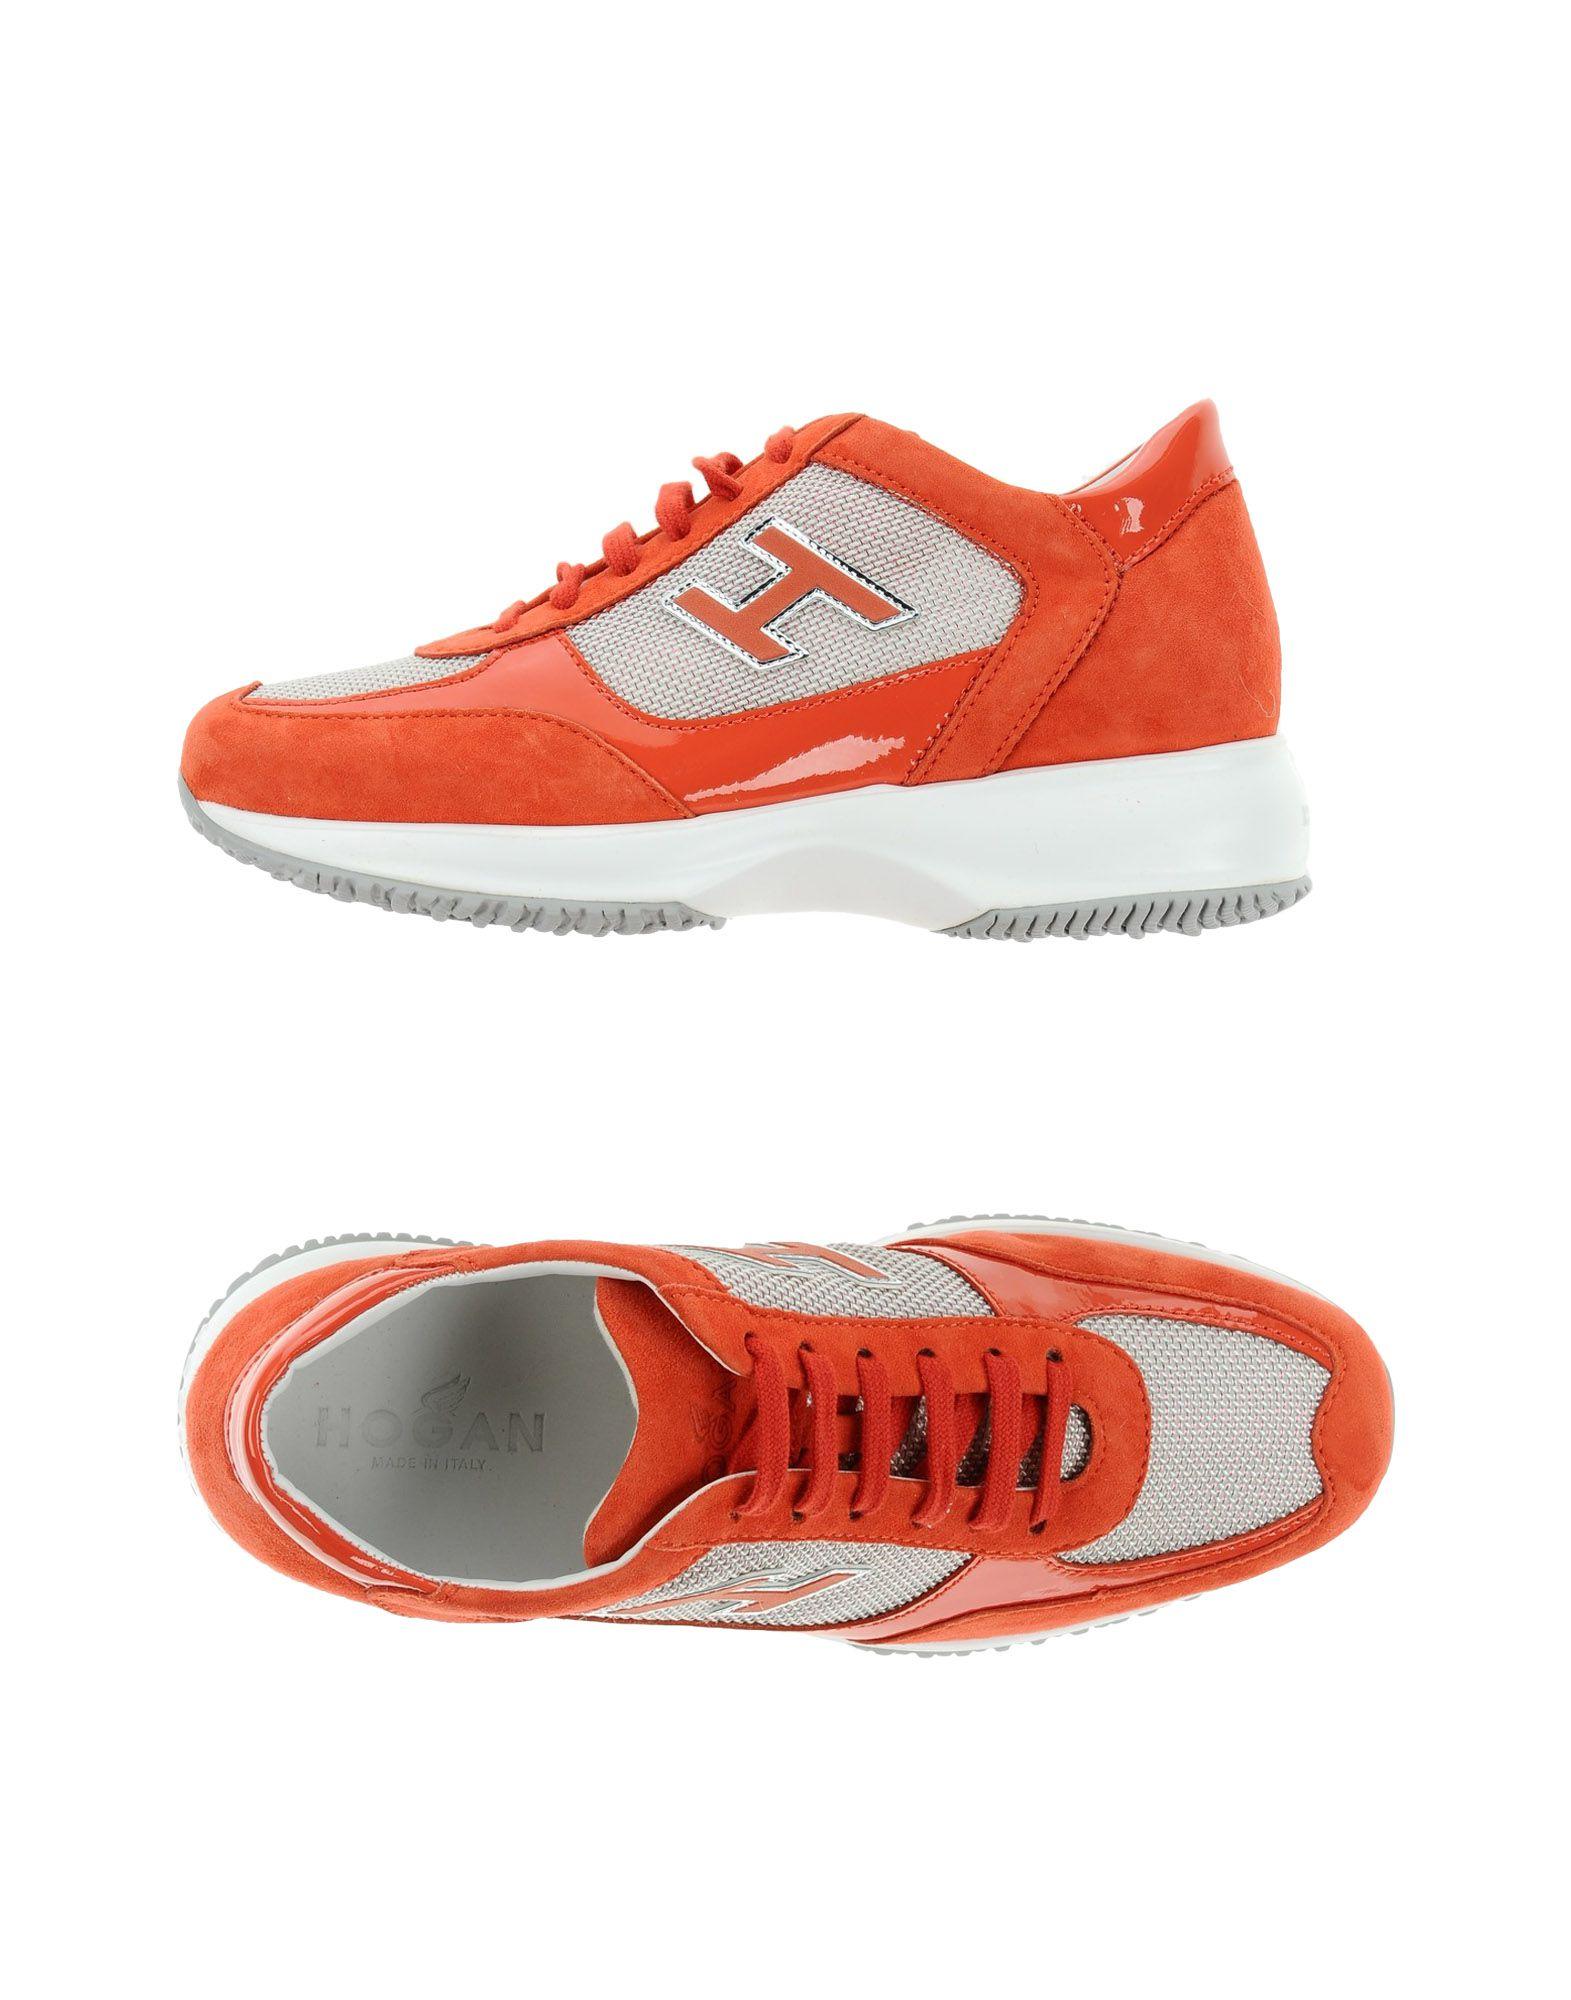 Hogan Sneakers Sneakers Hogan Damen  11335817HO Heiße Schuhe ffe2c1